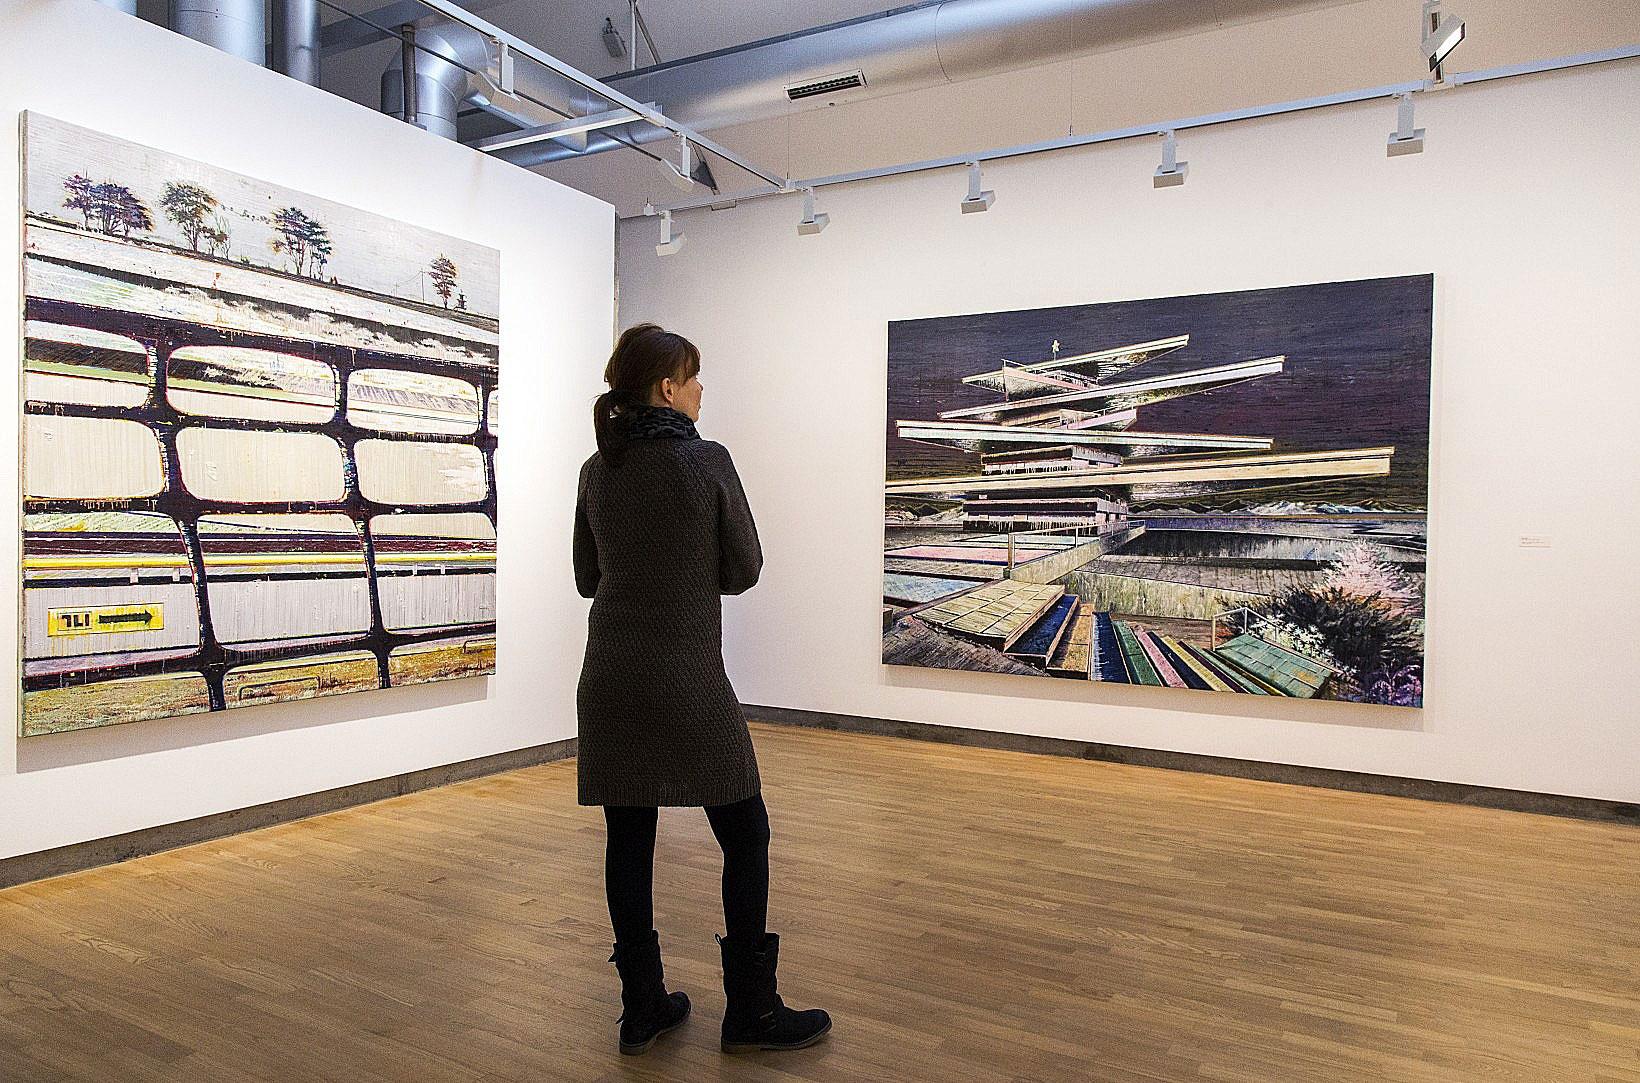 Lightboard gross  eur erco municipal gallery bietigheim bissingen image 1 8